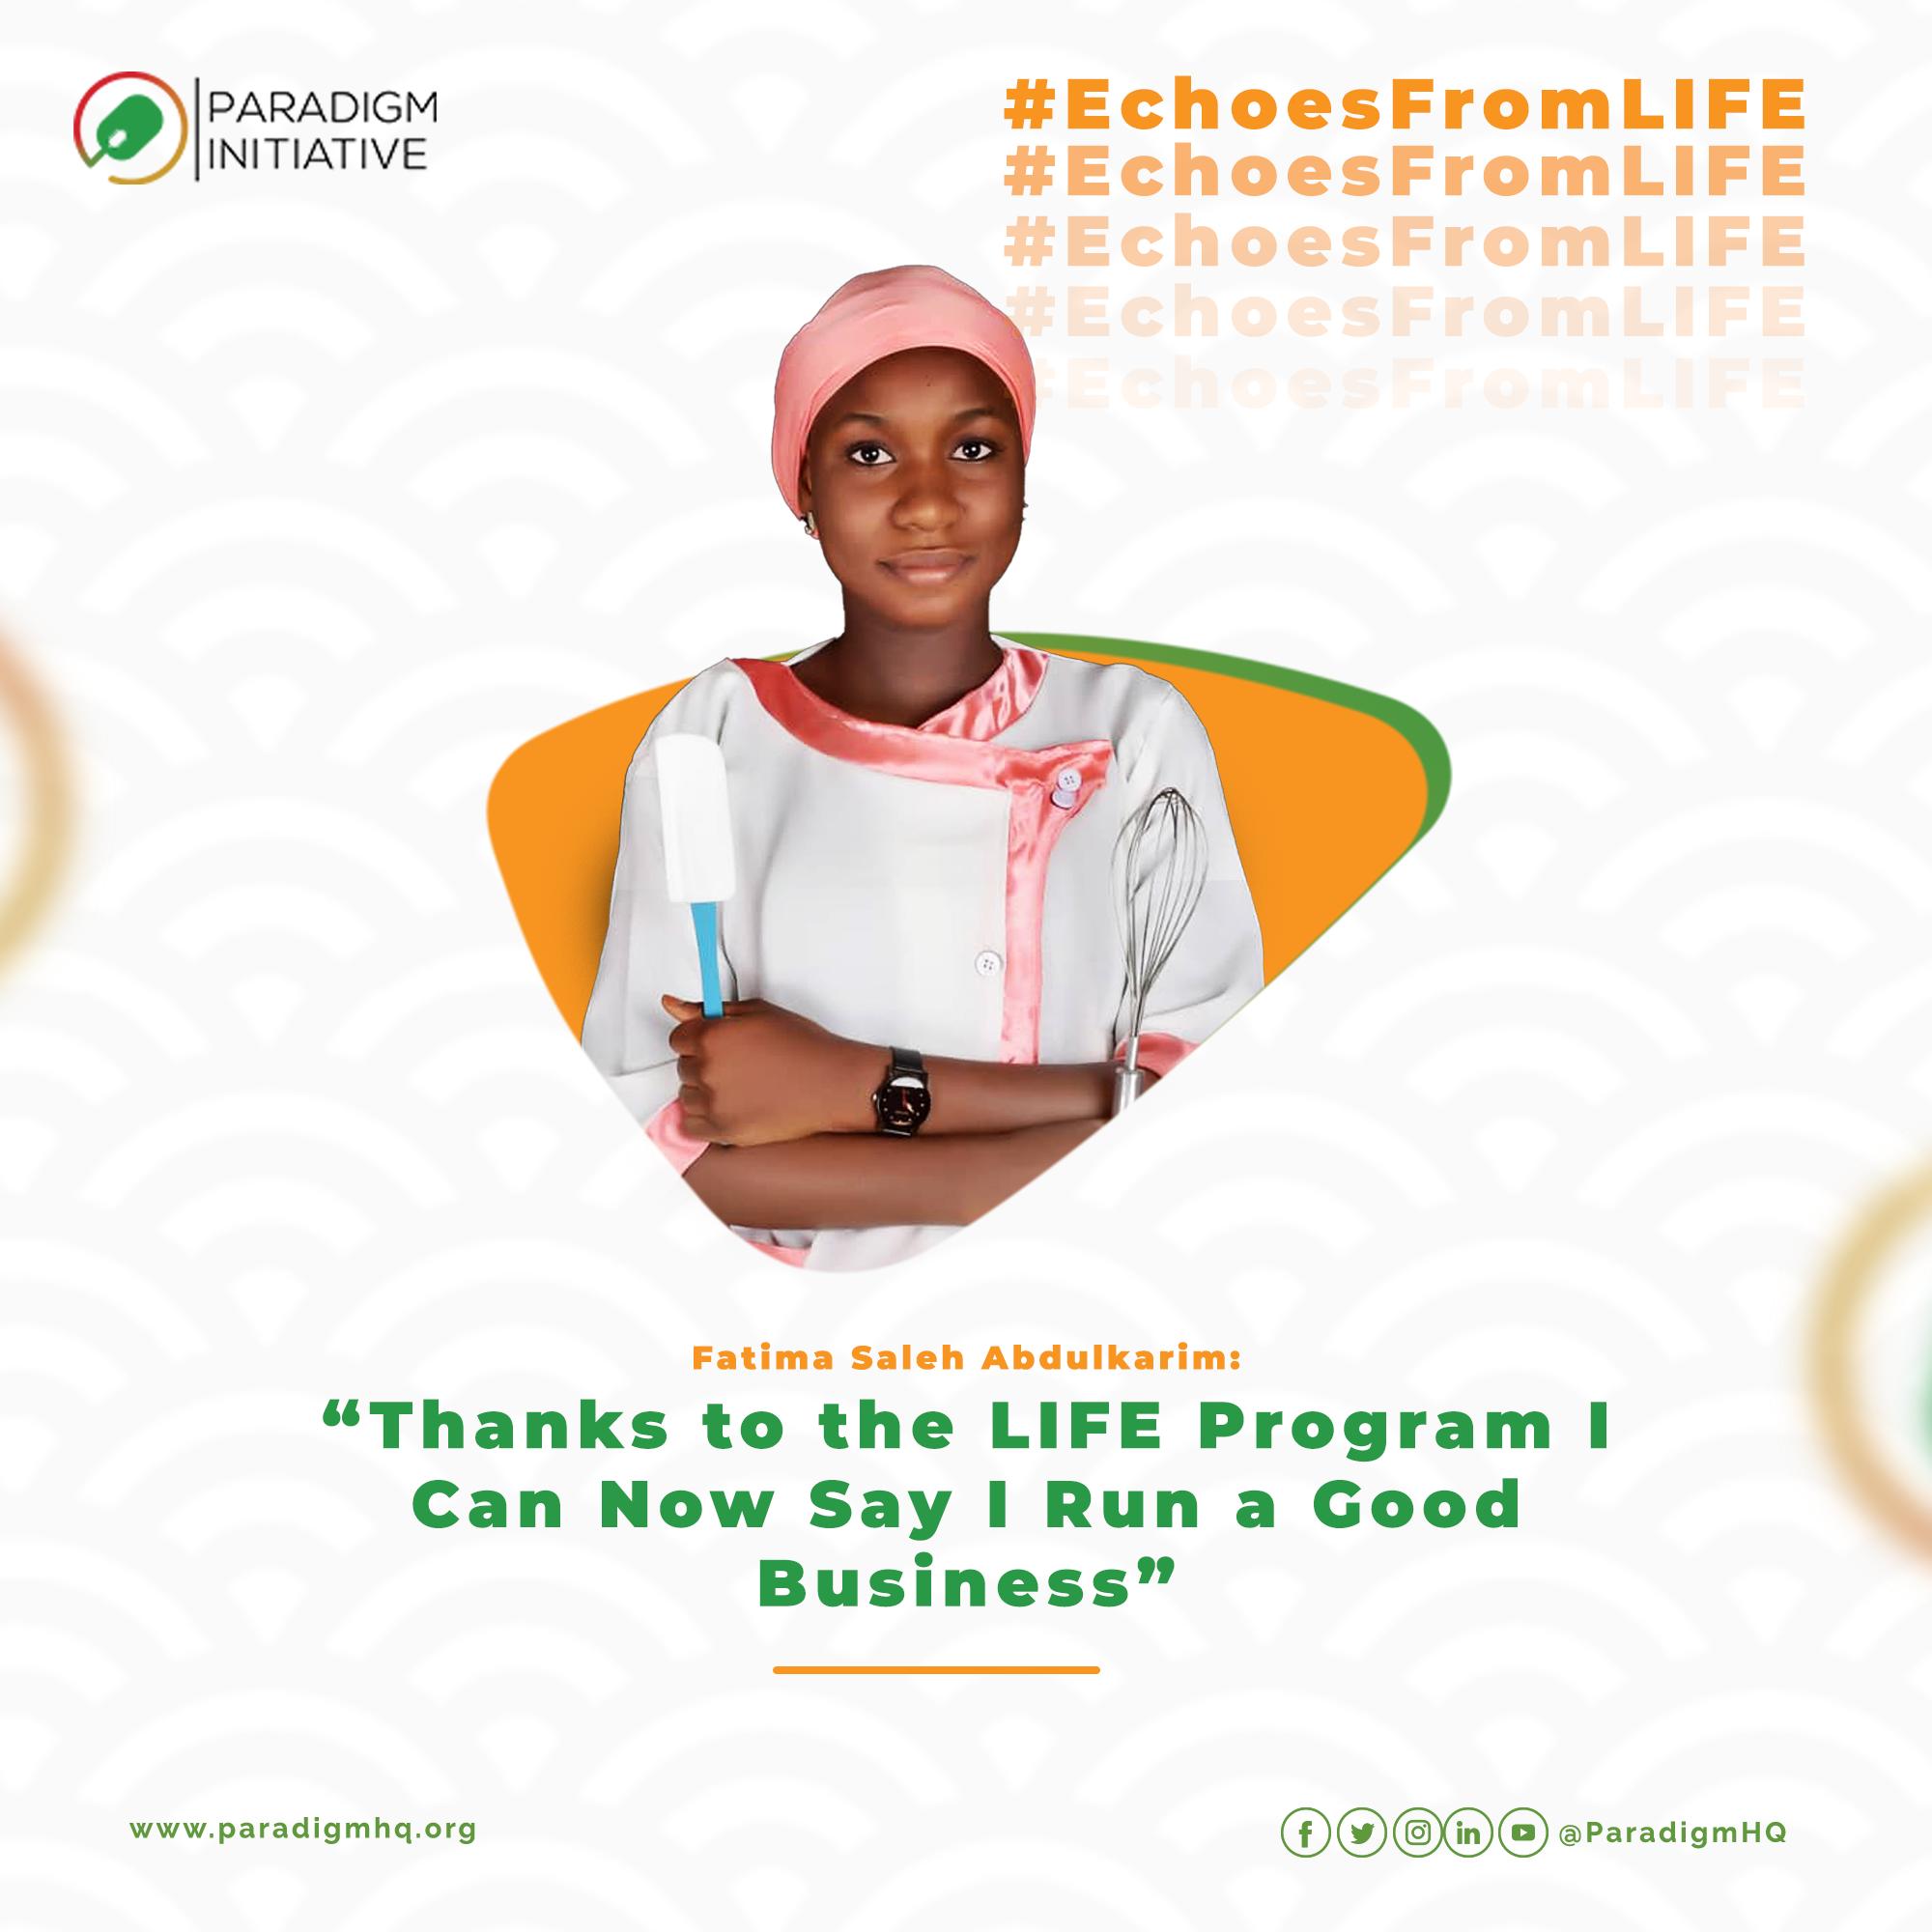 Fatima Saleh Abdulkarim: Thanks to the LIFE Program I Can Now Say I Run a Good Business.